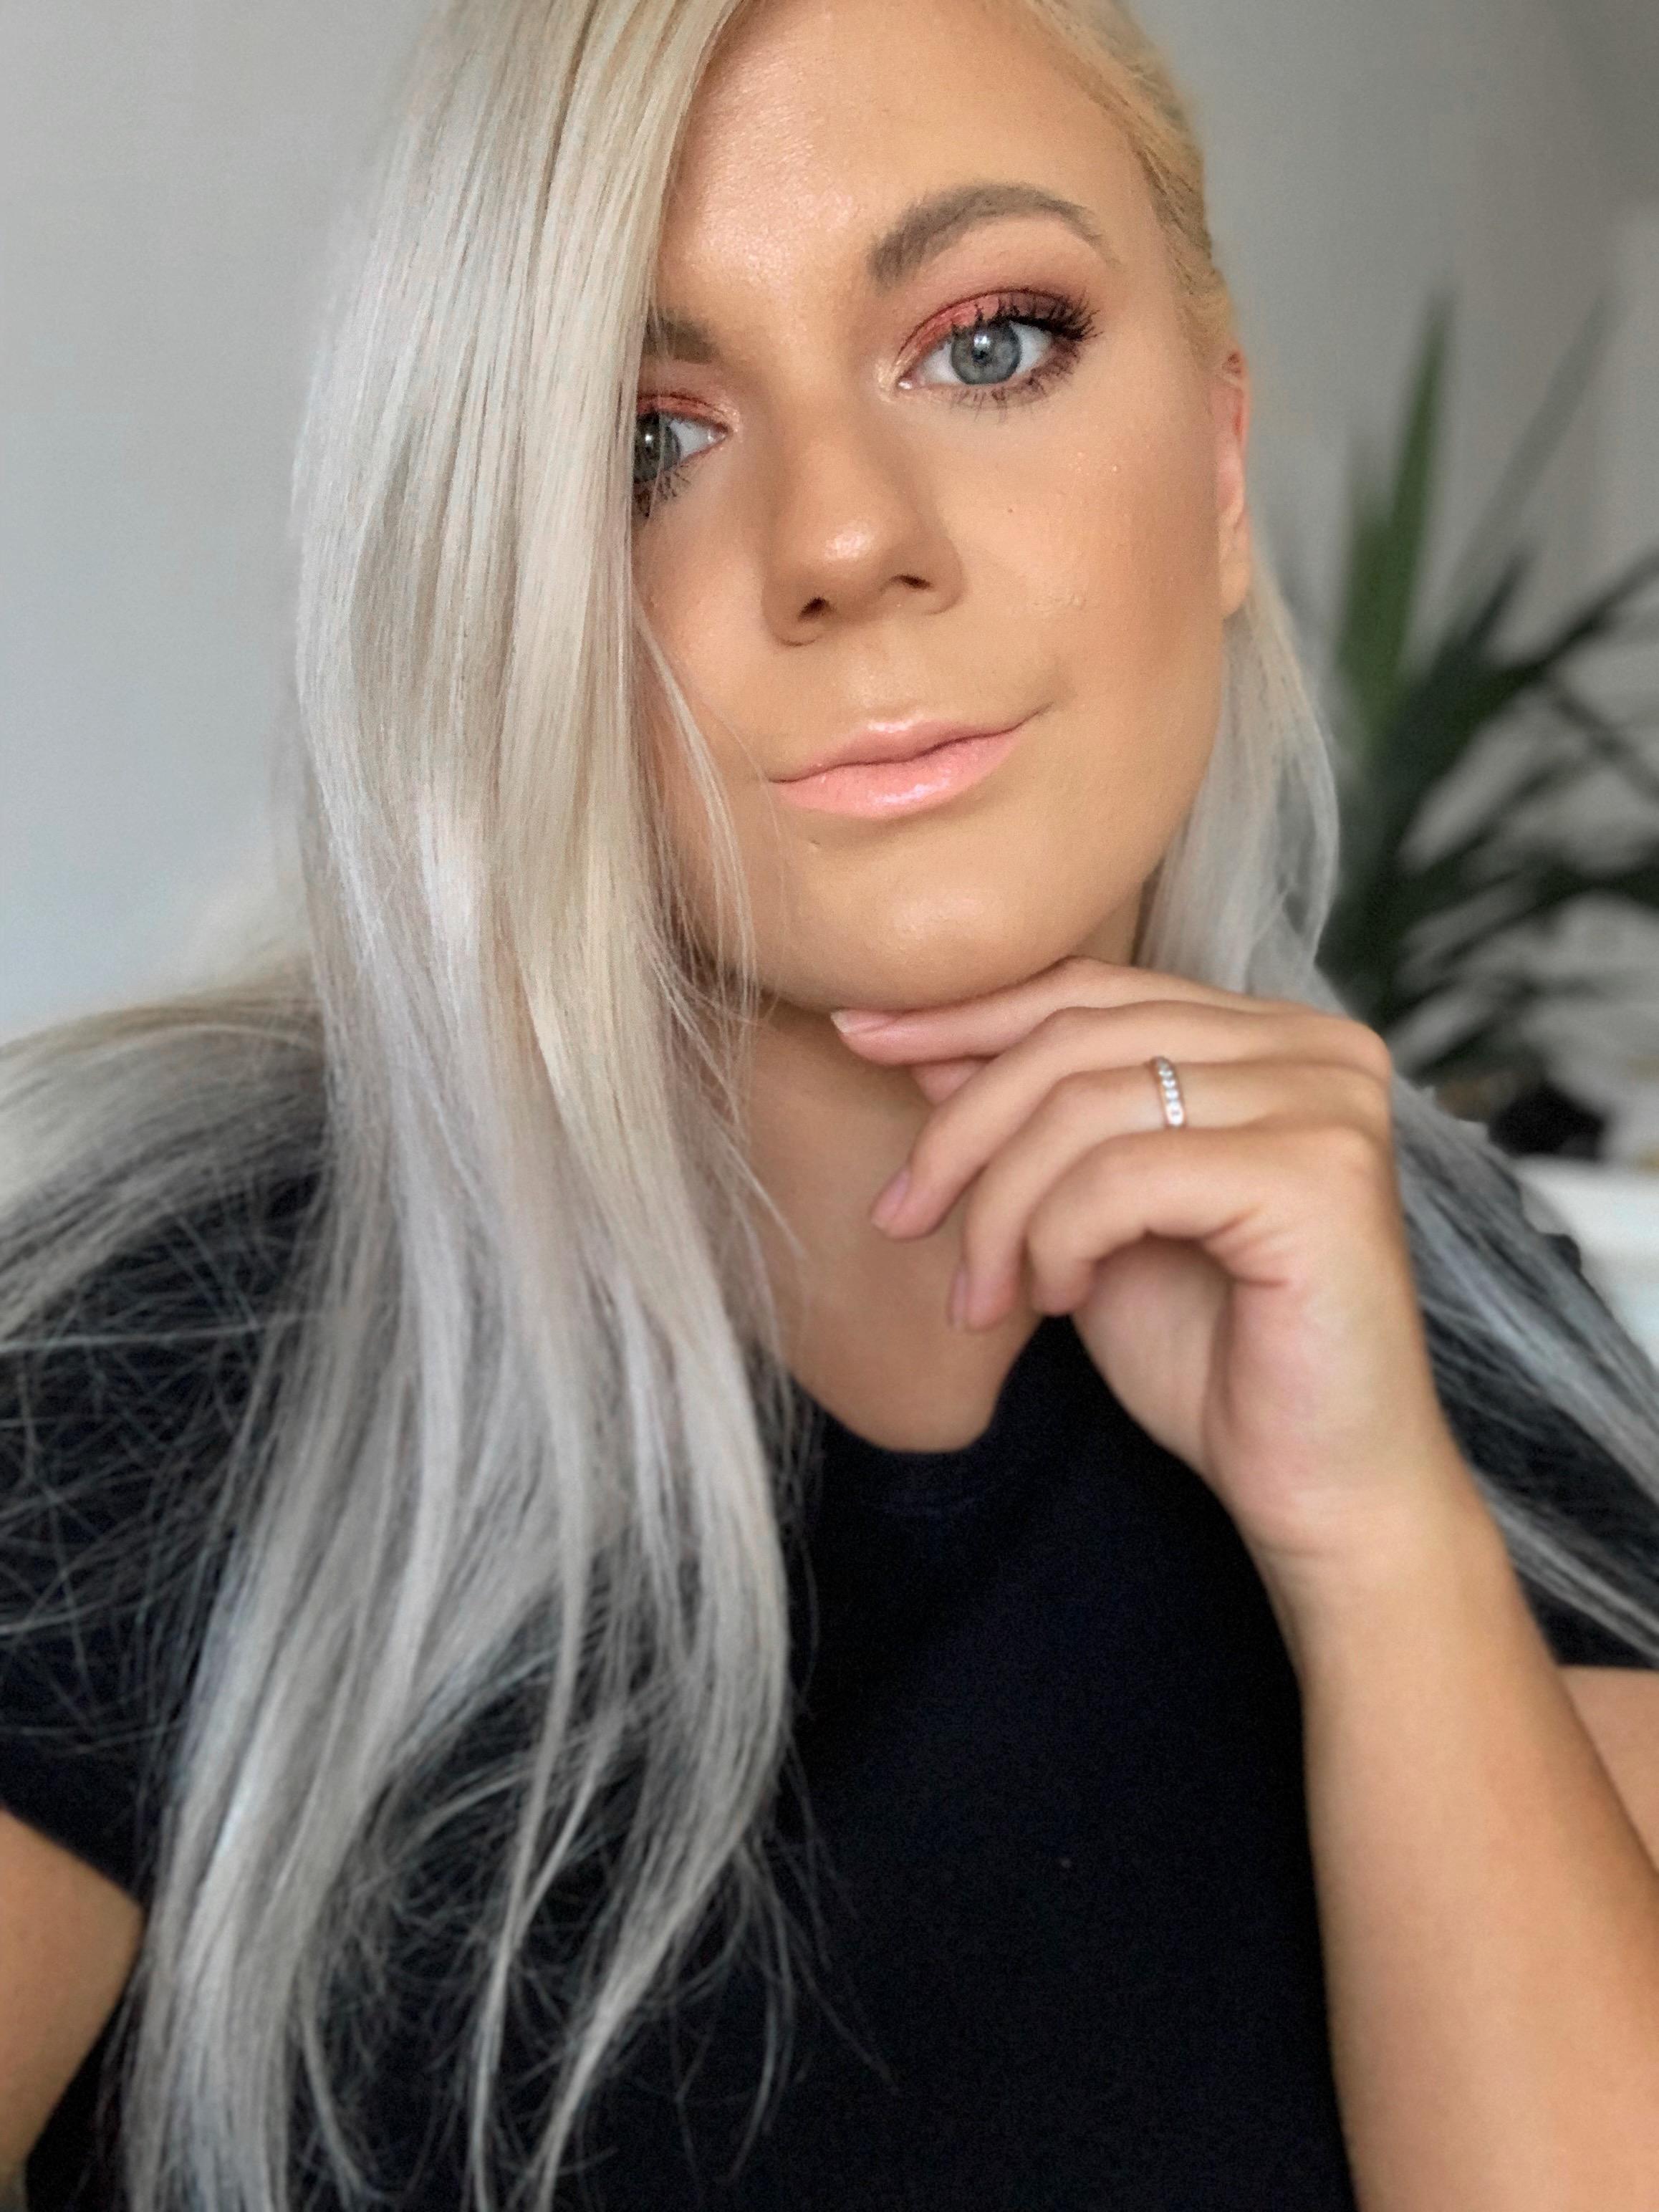 česká beauty blogerka lucie.wink elbeautyblog